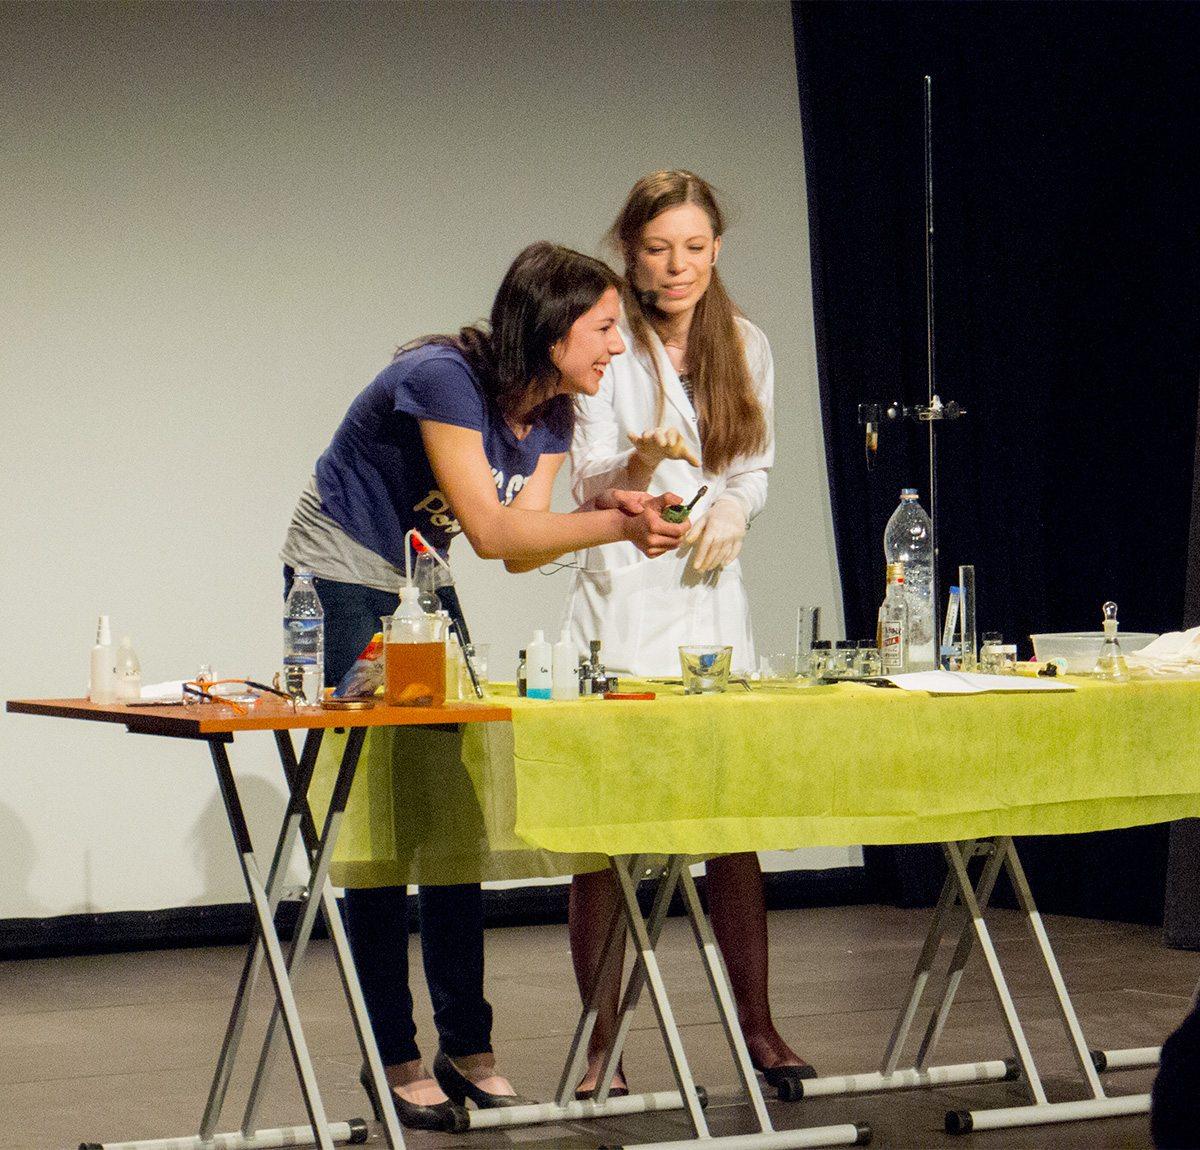 Justyna Stachniuk i Marta jasińska na seminarium z chemii dla magików